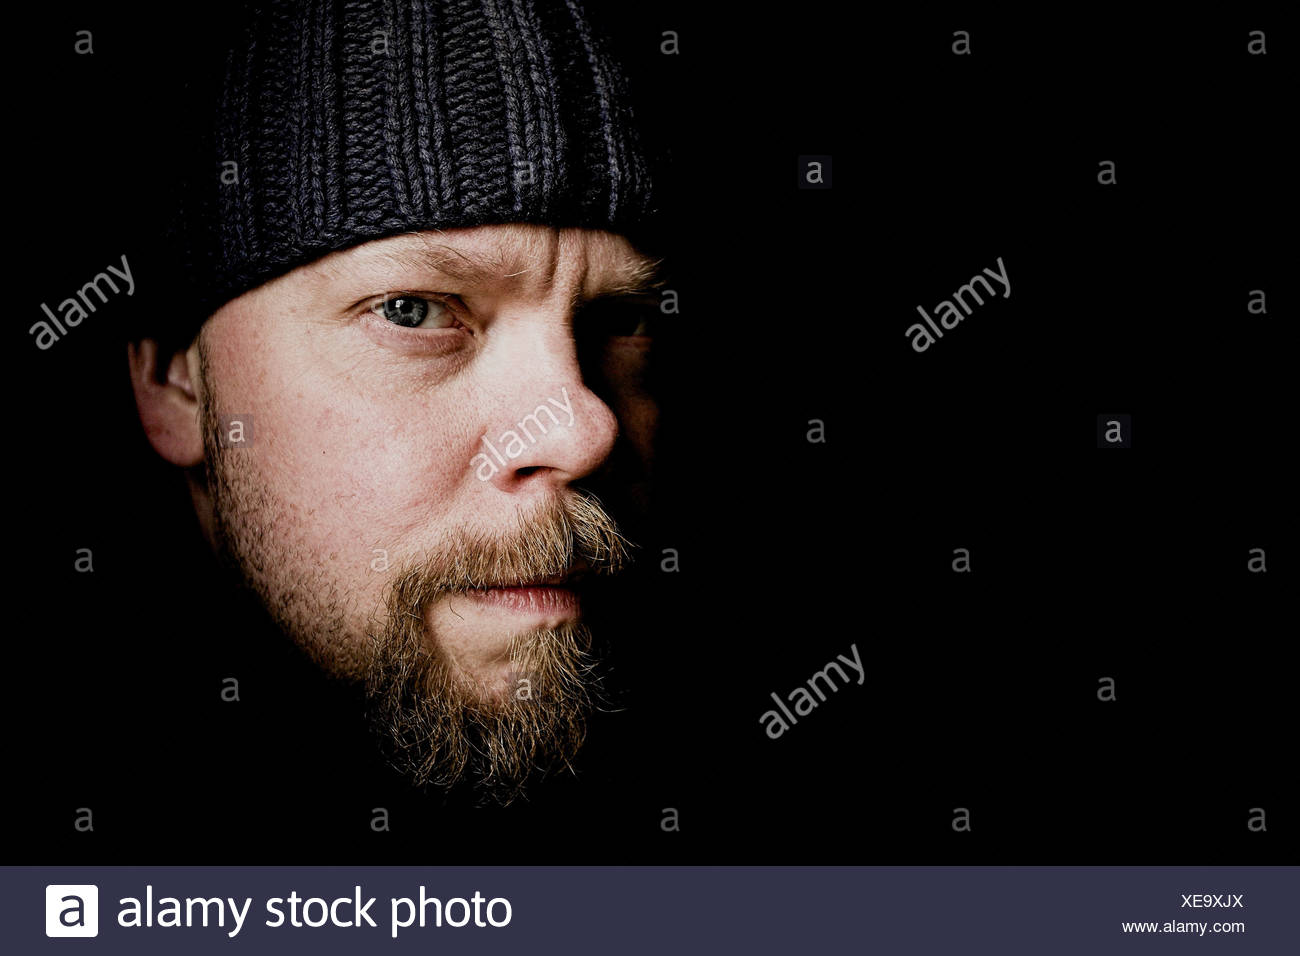 Portrait of professionel flyfisherman Mattias Drugge, Sweden. He is wearing a black hat and has a short beard. Stock Photo